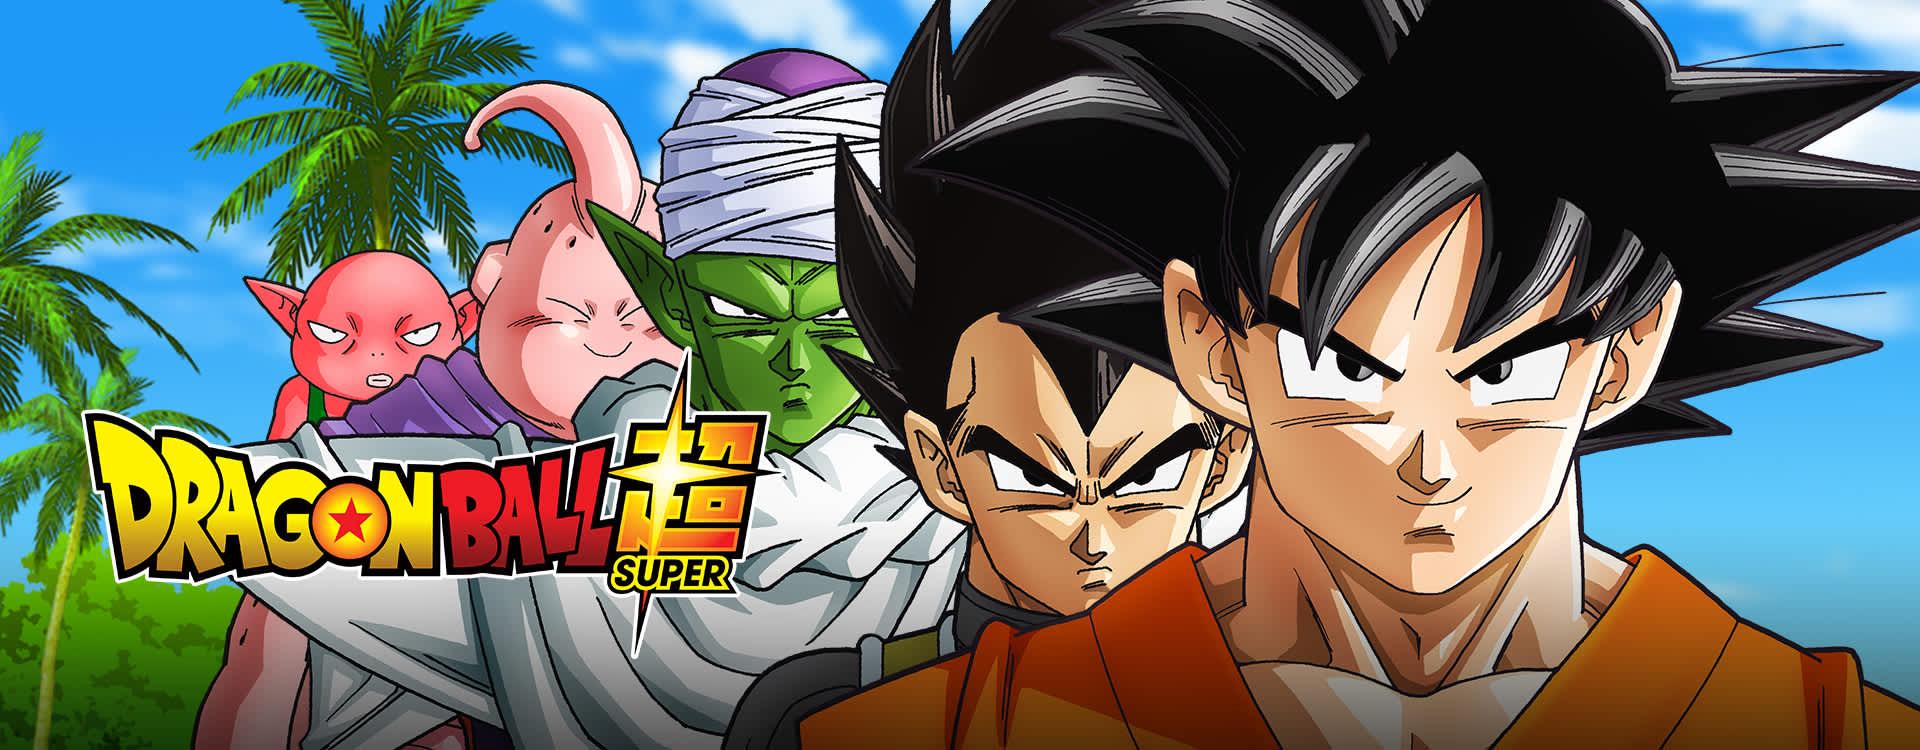 Dragon Ball Super Images